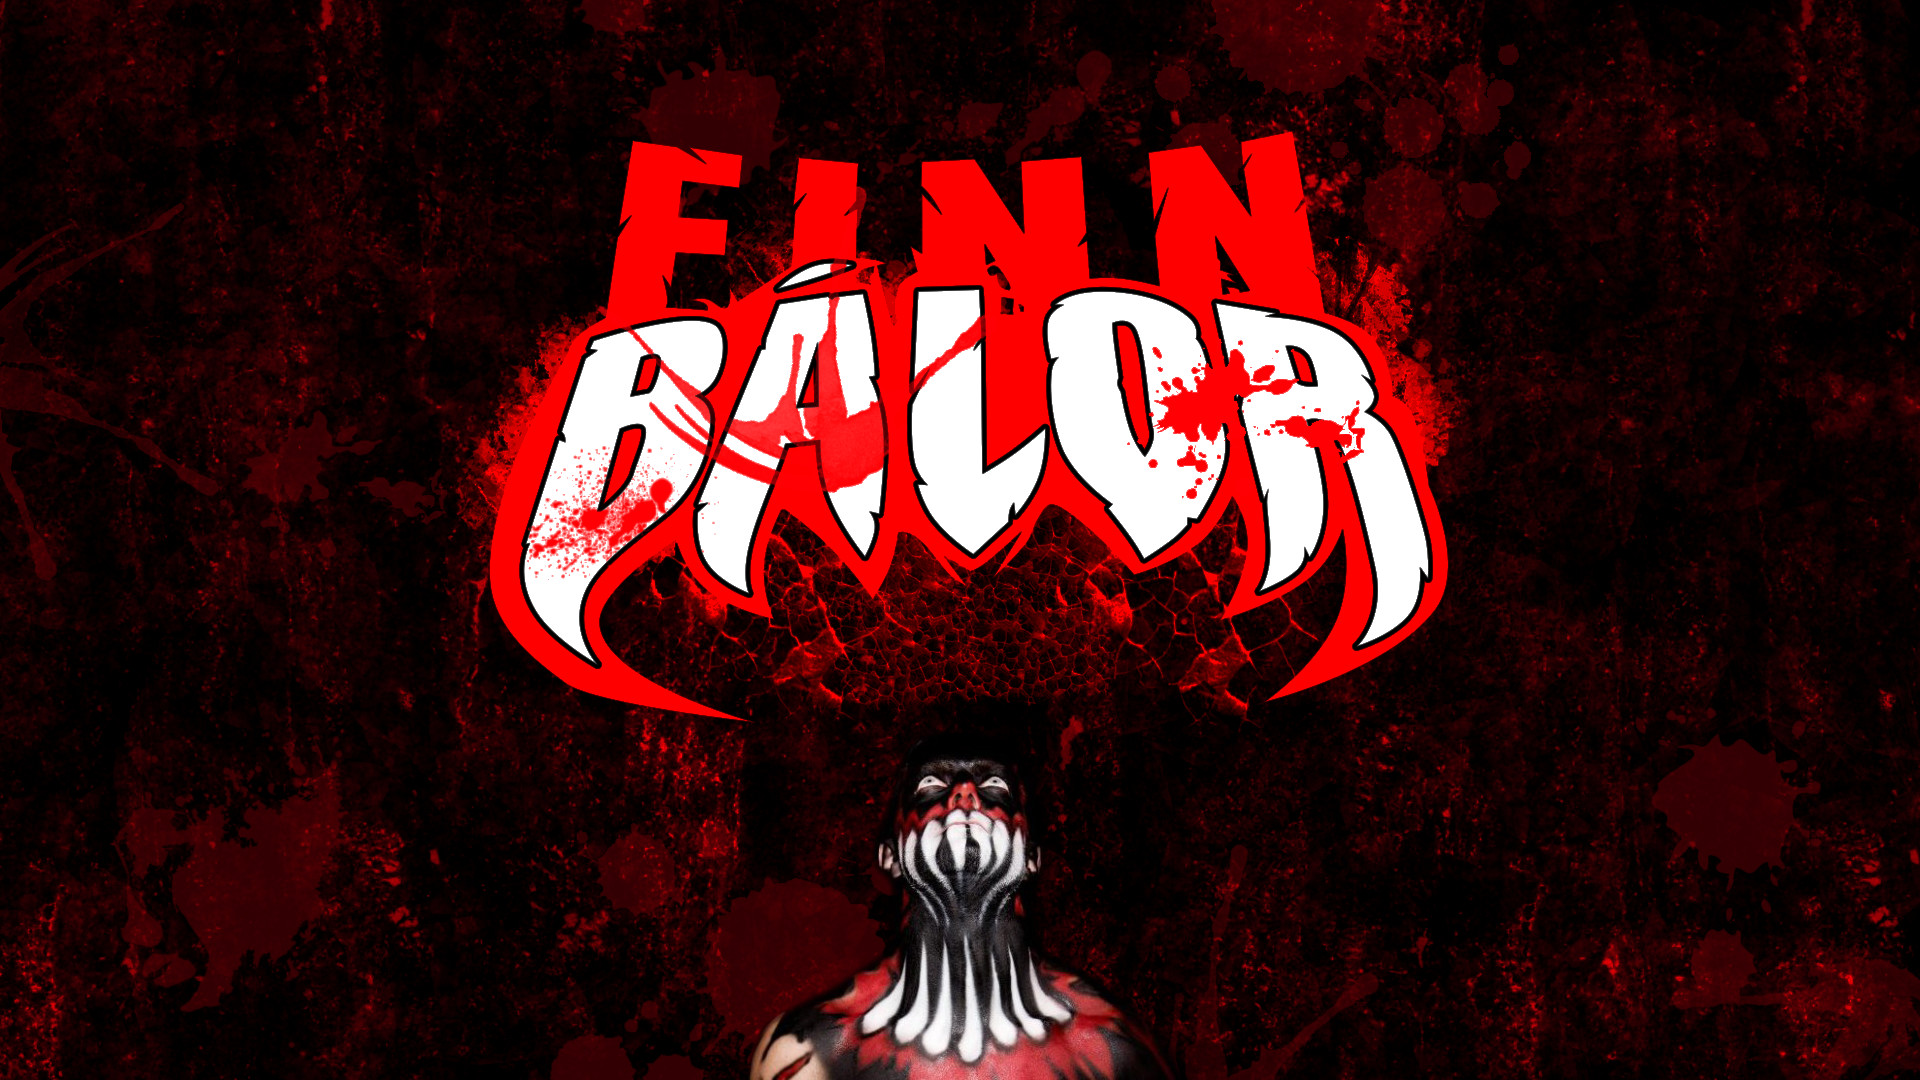 balor club wallpaper 85 images